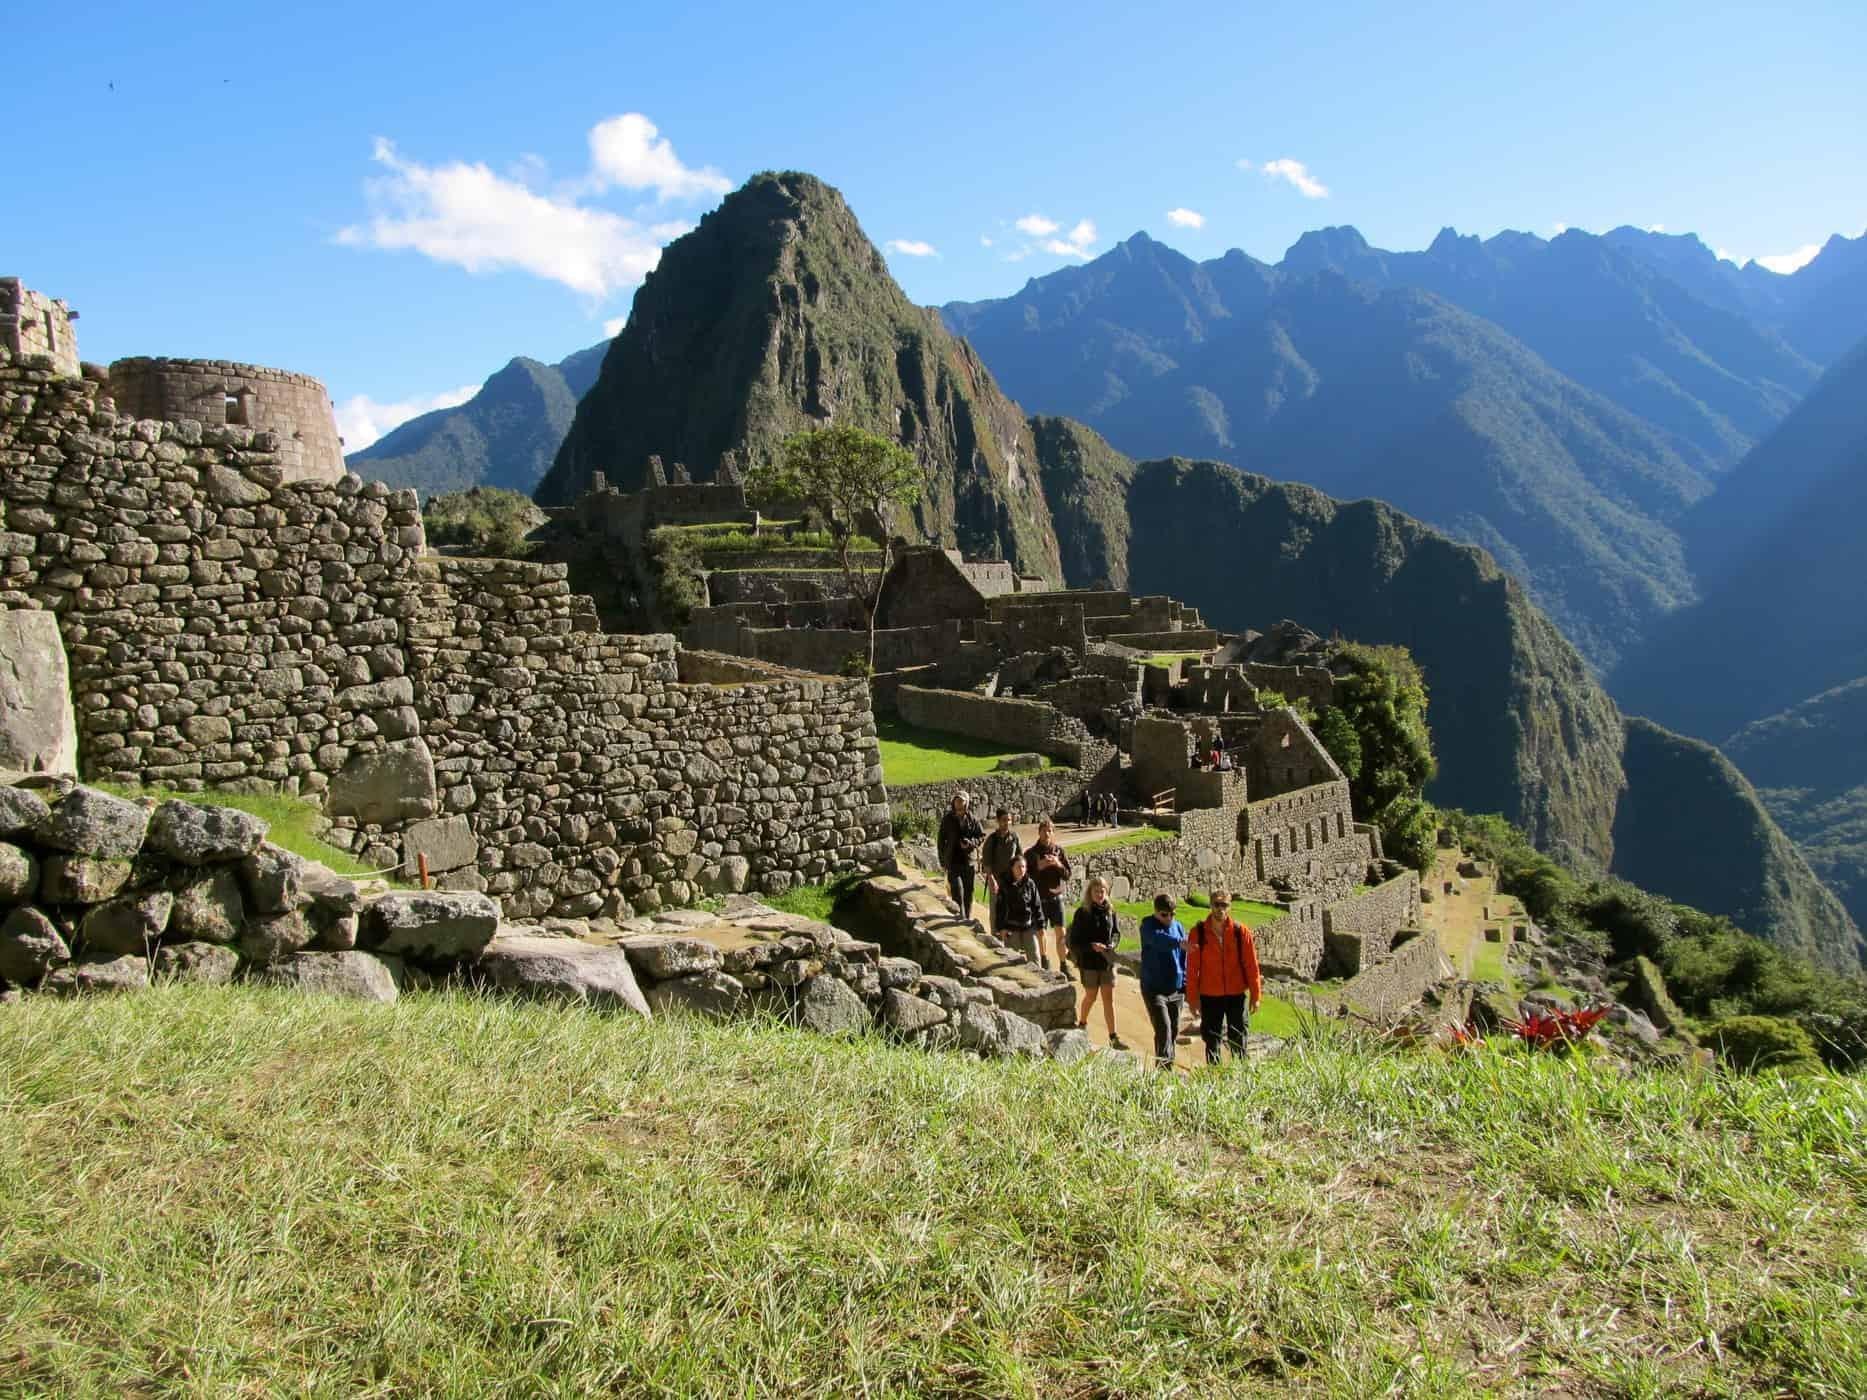 A Trekking Group at Machu Picchu